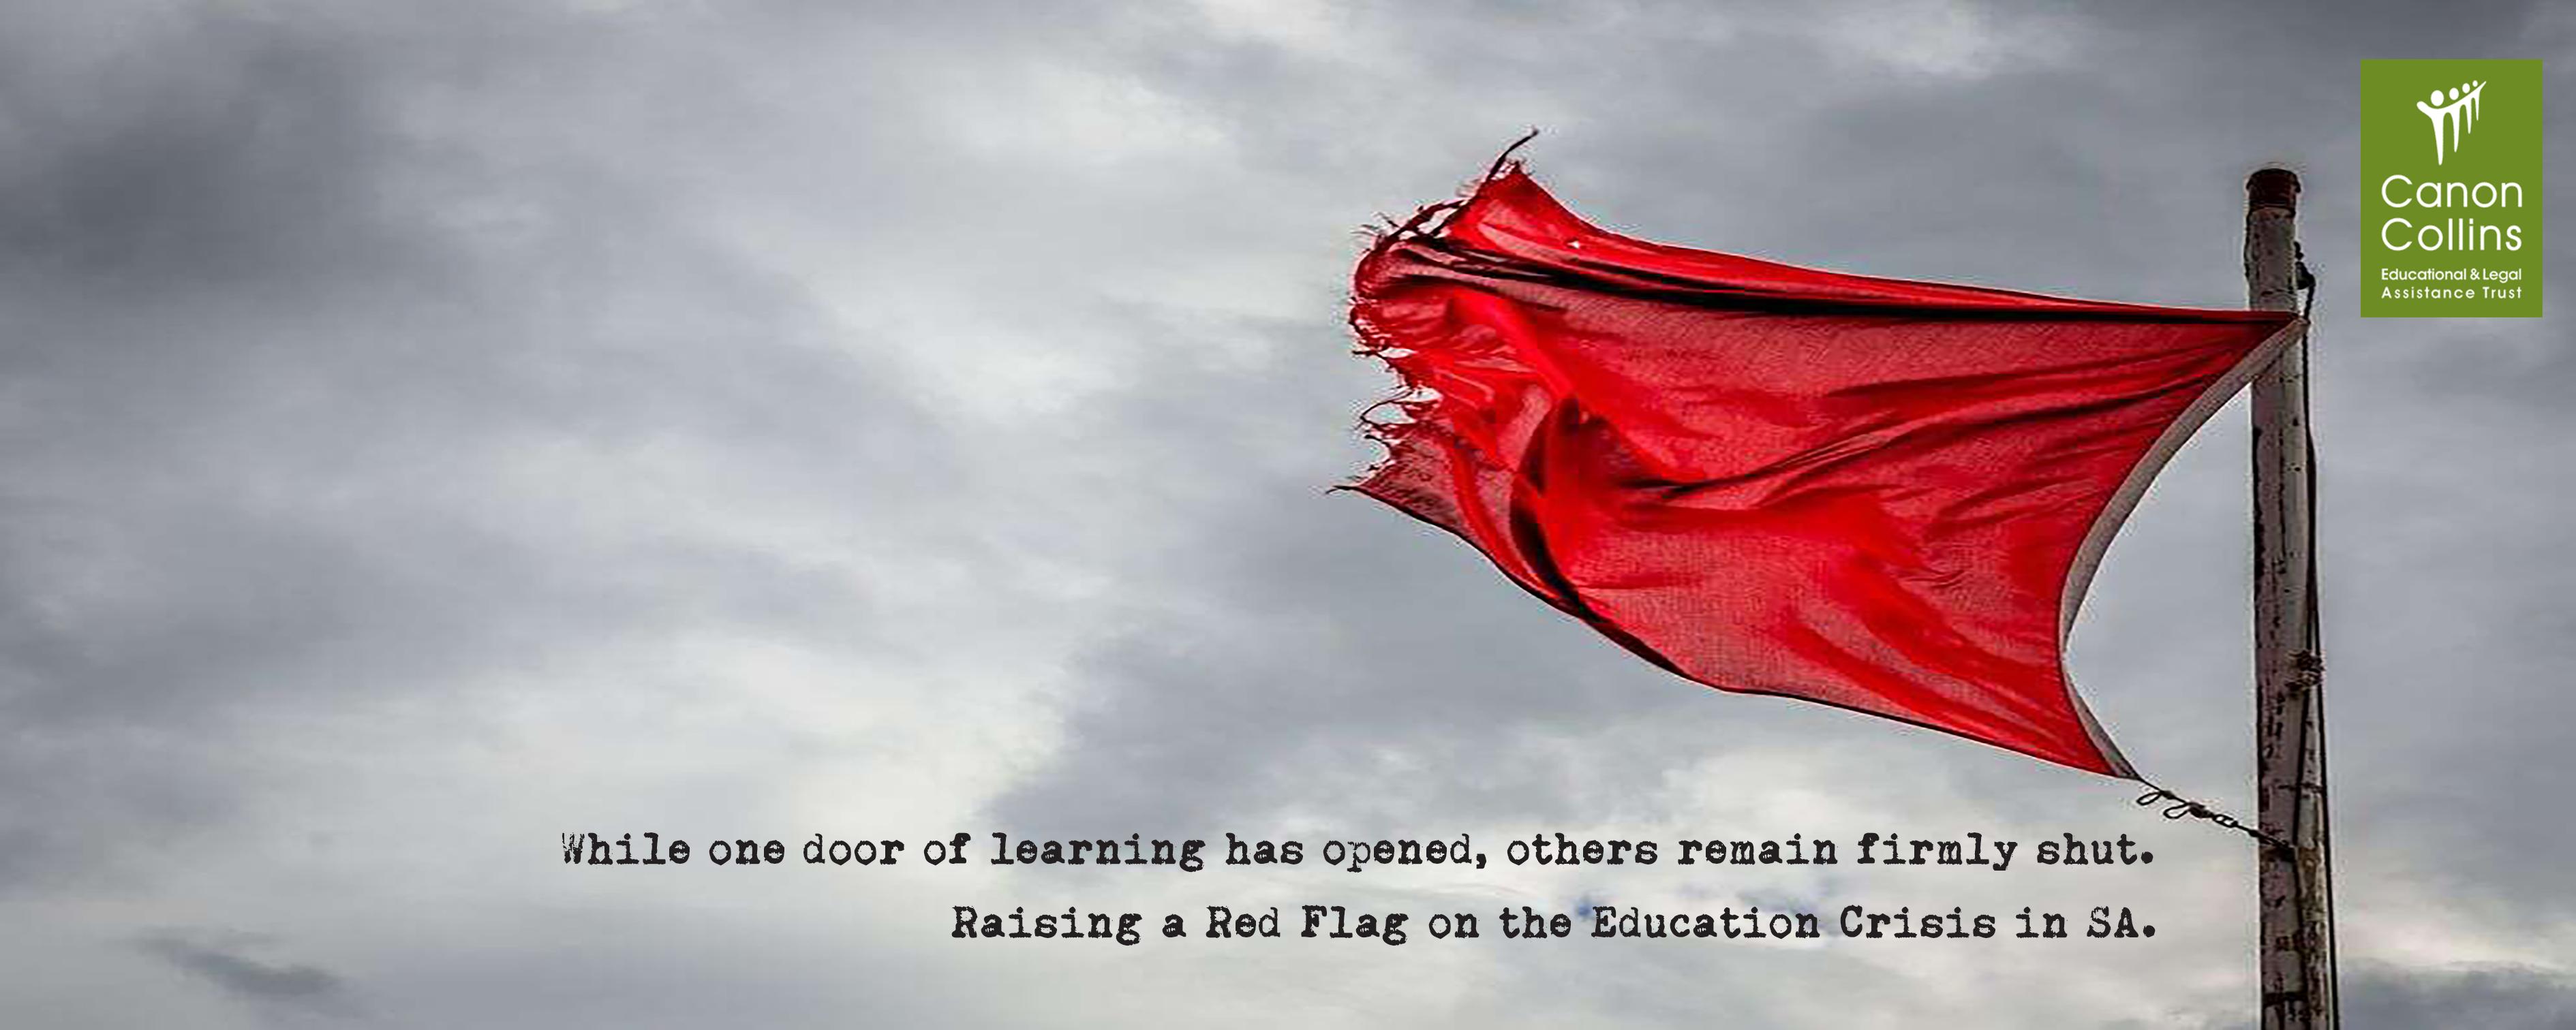 Education is Failing